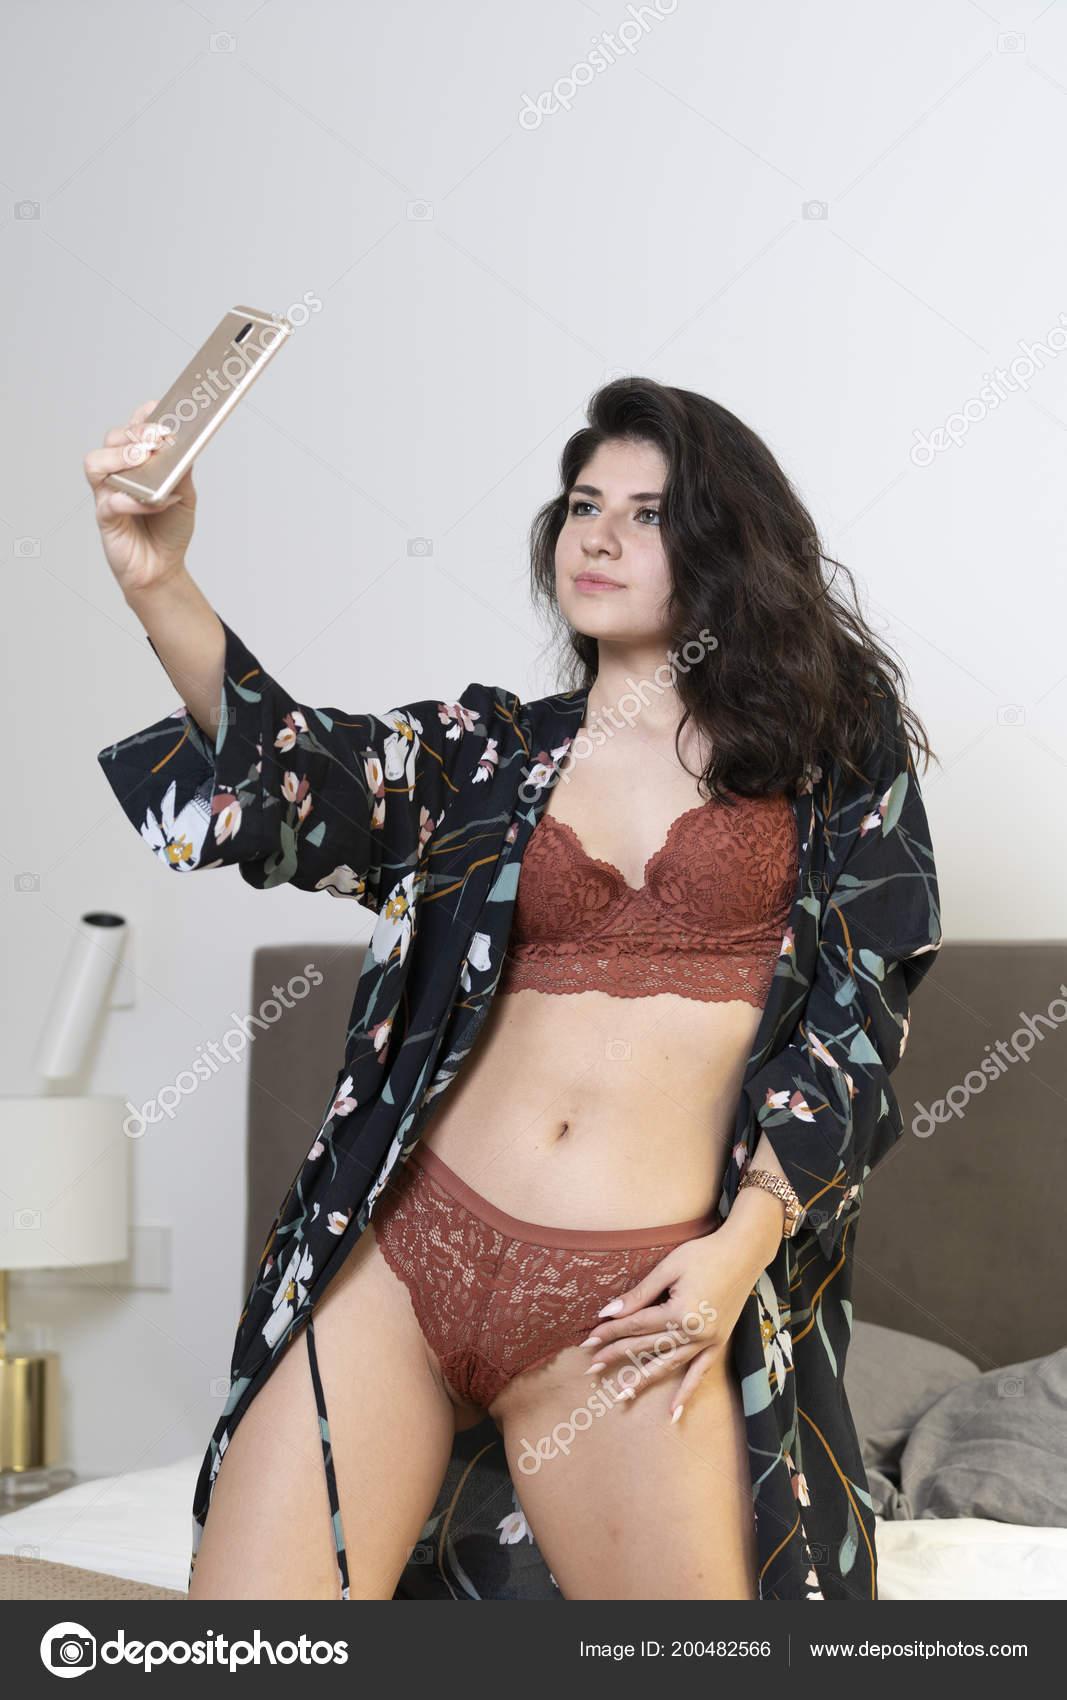 Burning vagina pap smear